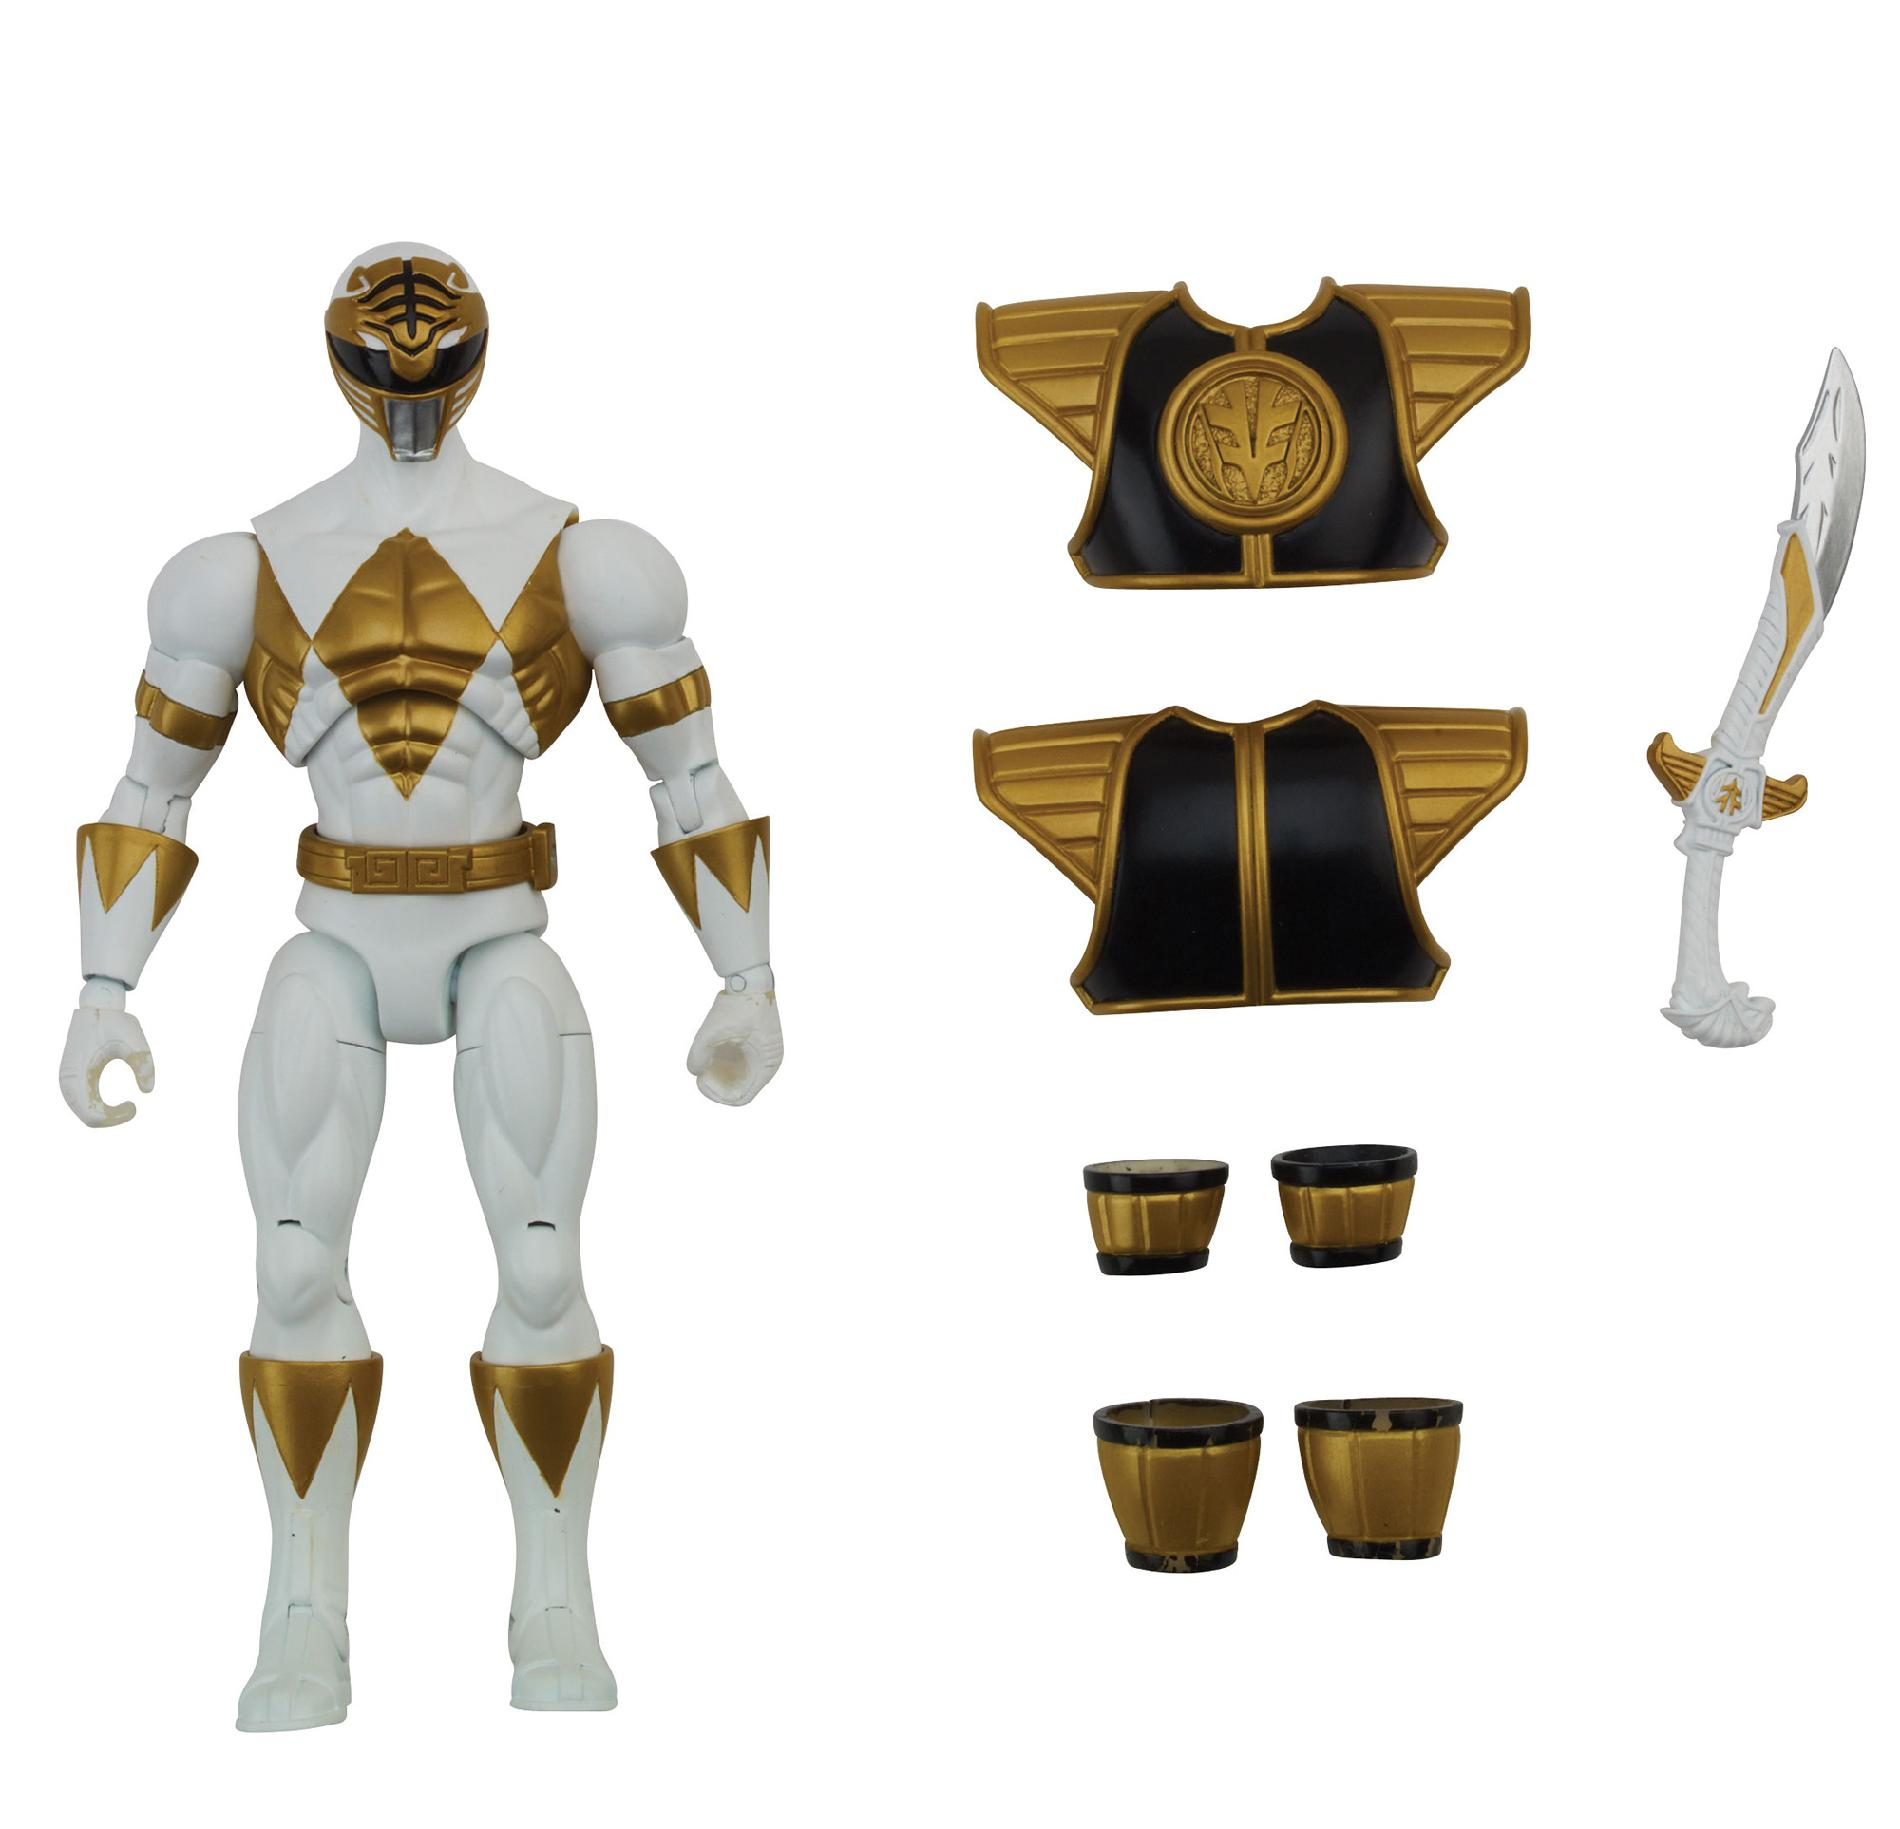 Power Rangers Armored Mighty Morphin White Ranger - Toys